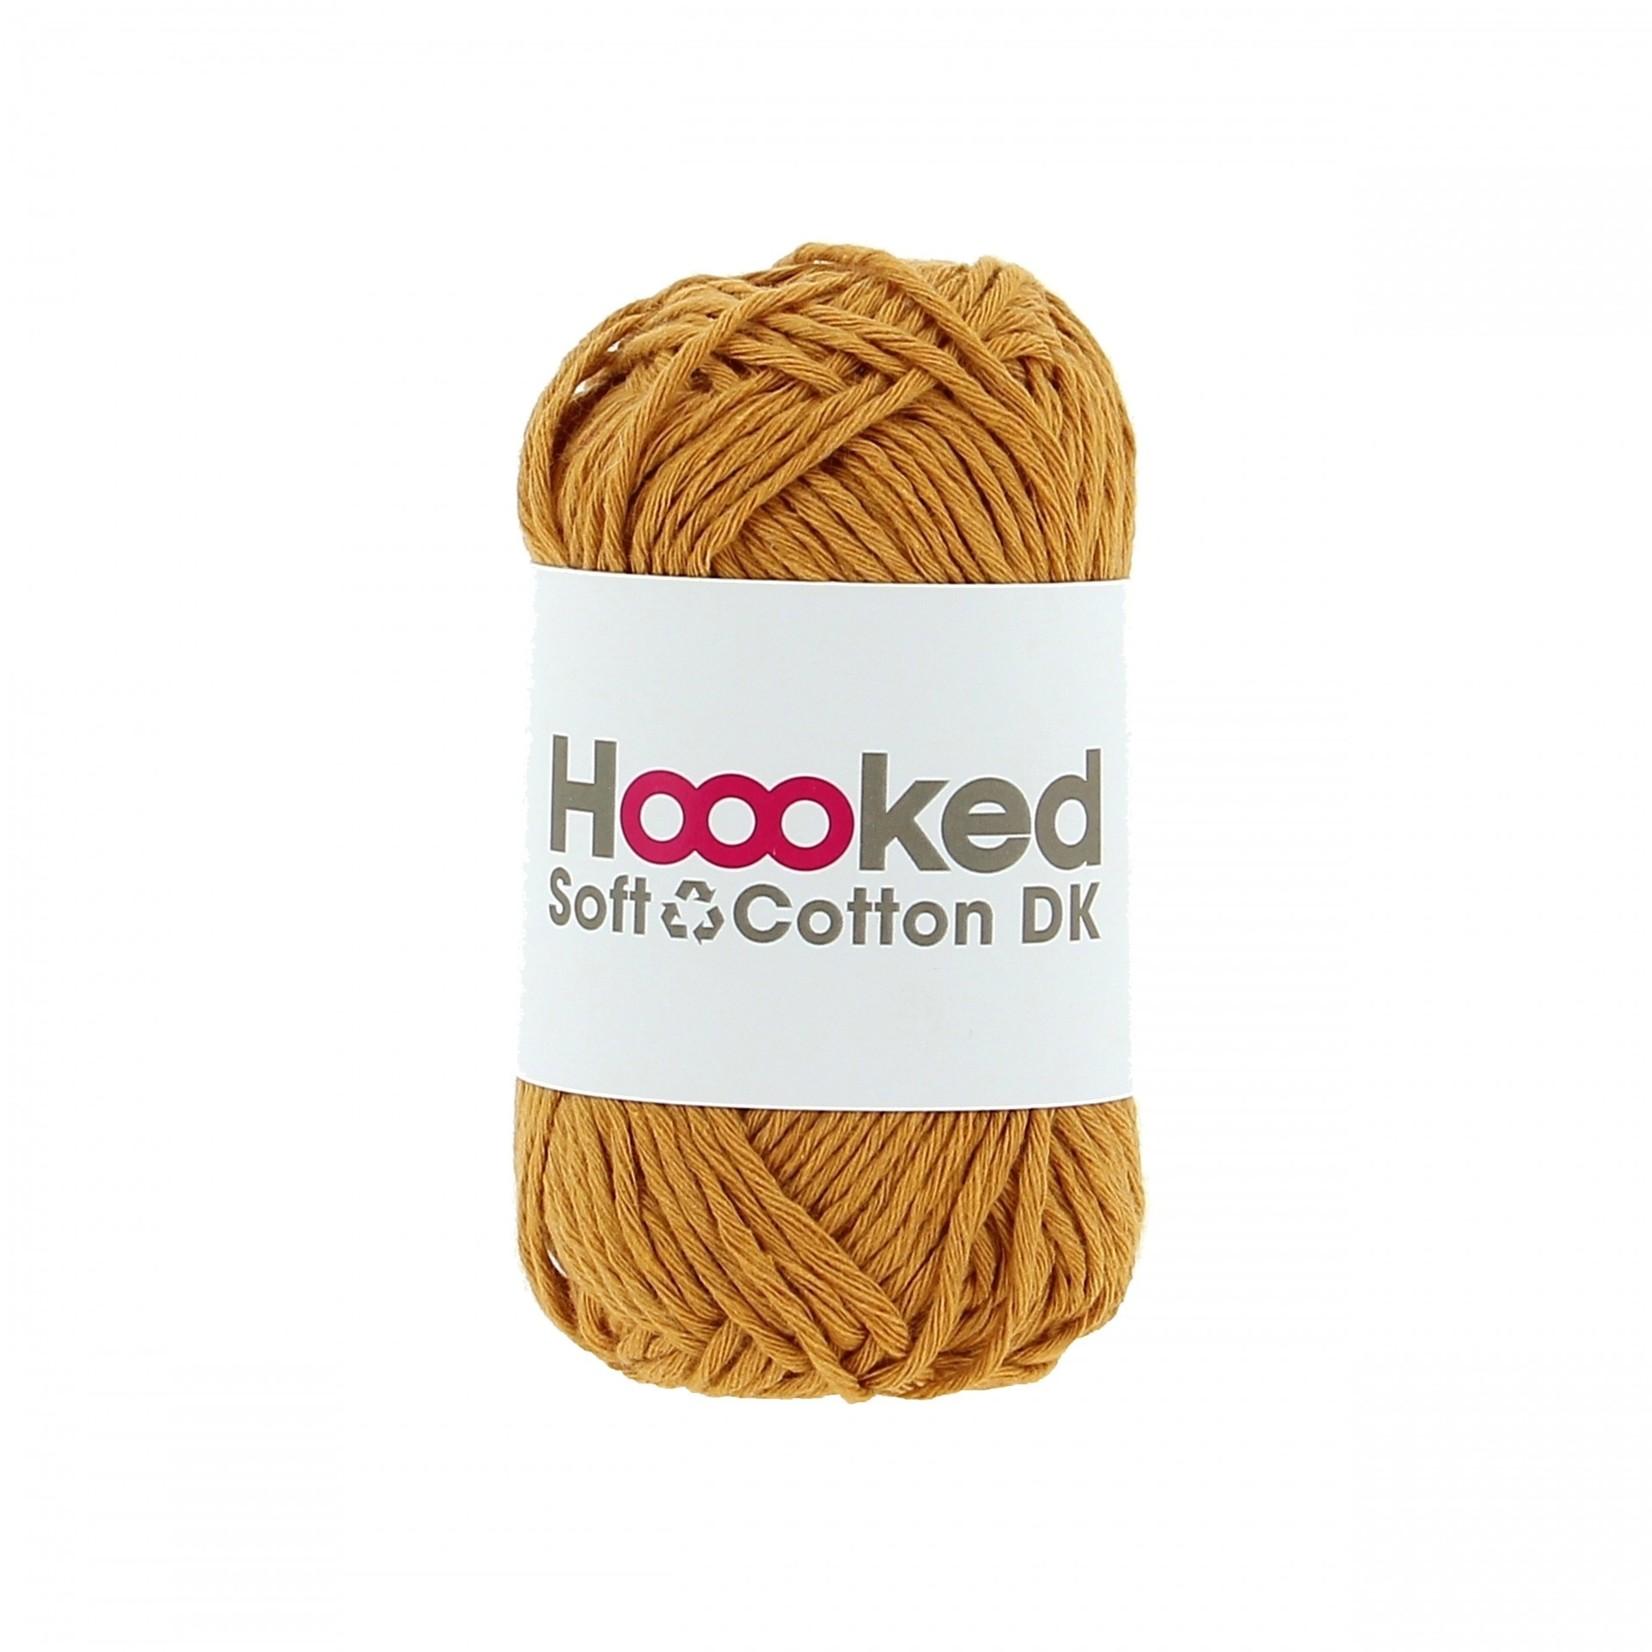 Hoooked Hoooked Soft Cotton DK Sienna Ocre bundel 5 x 50 gr. / 85 m.